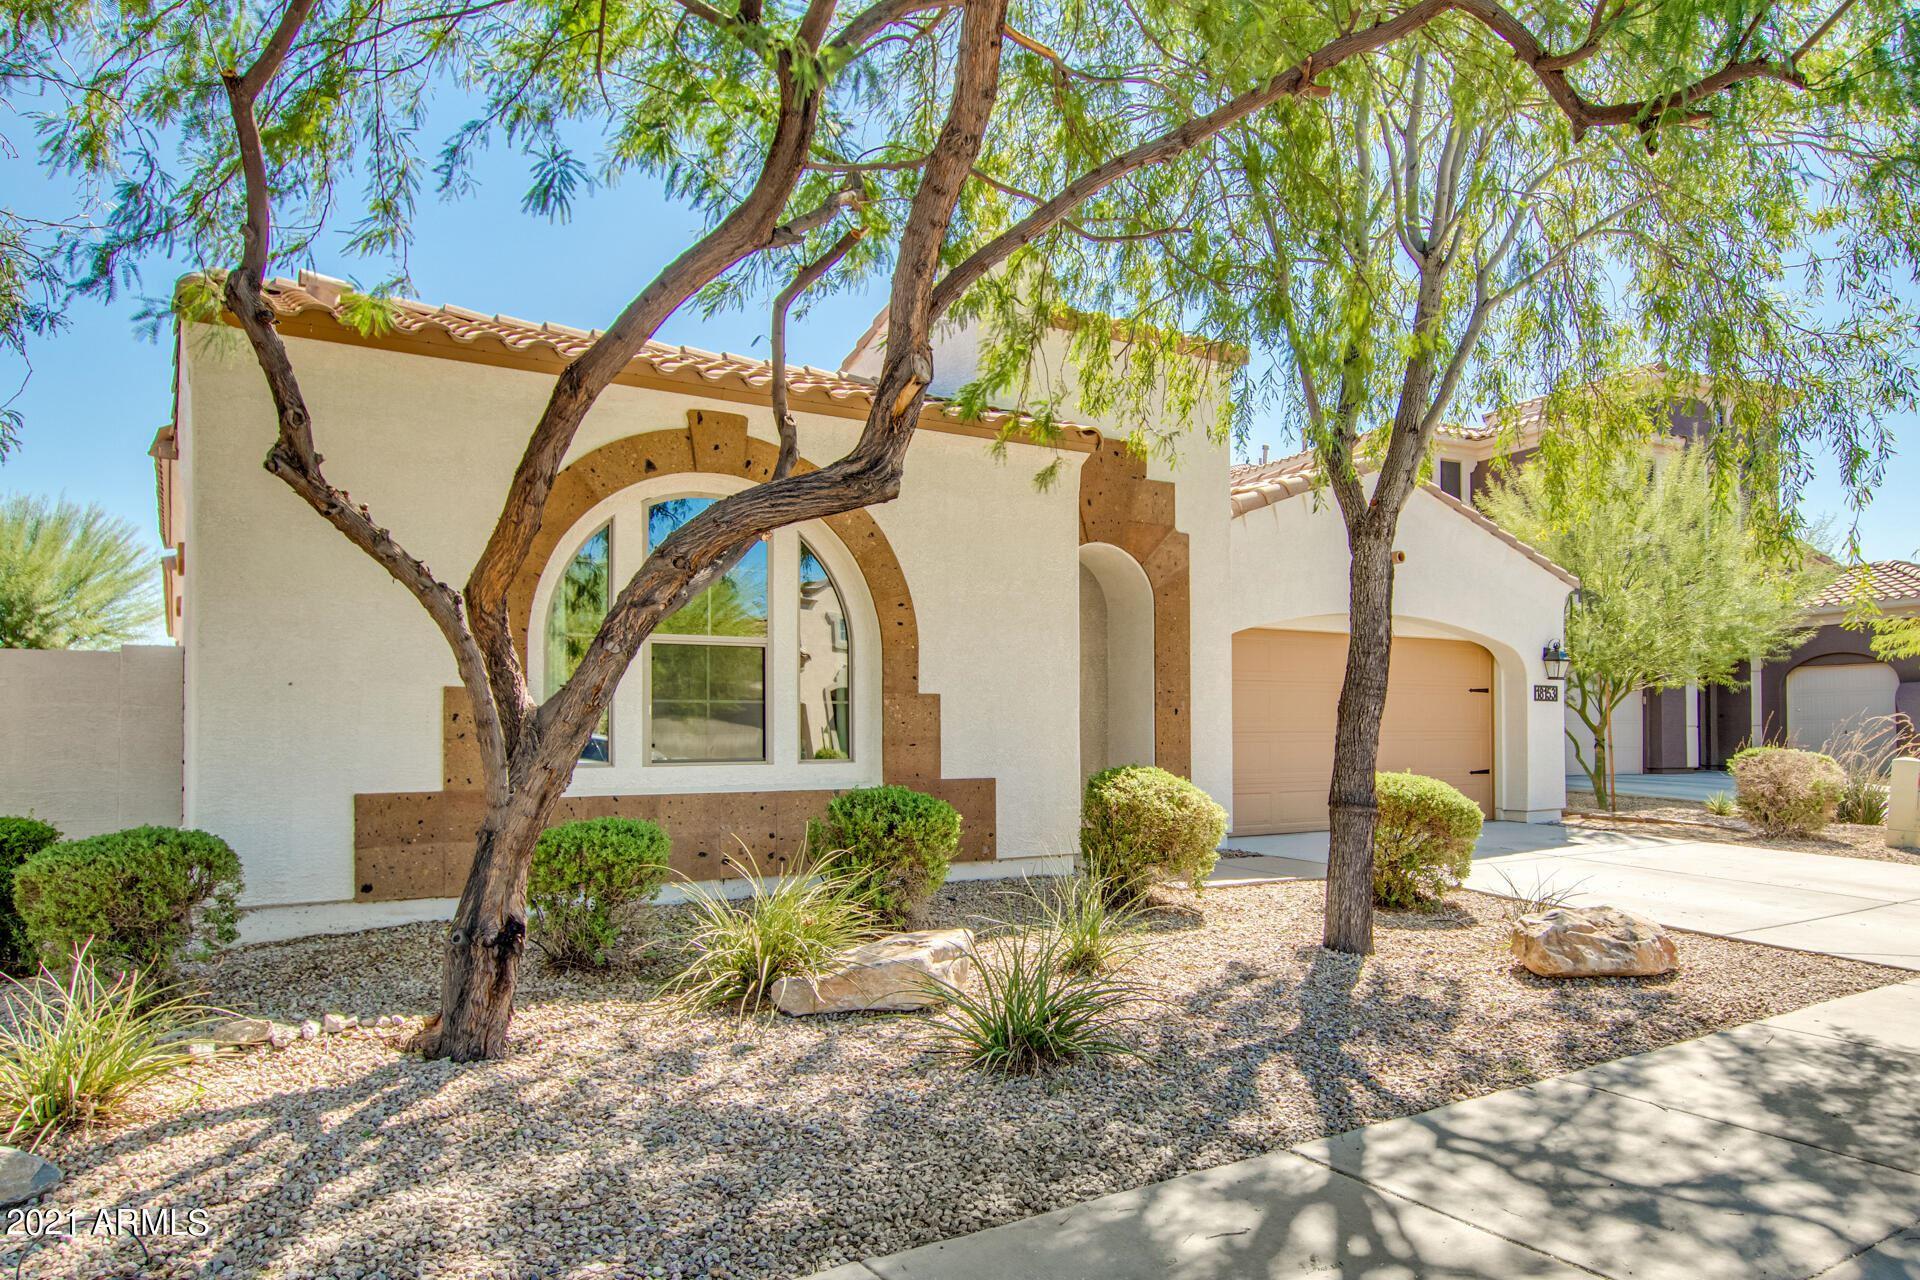 Photo of 18153 W MOUNTAIN SAGE Drive, Goodyear, AZ 85338 (MLS # 6307892)